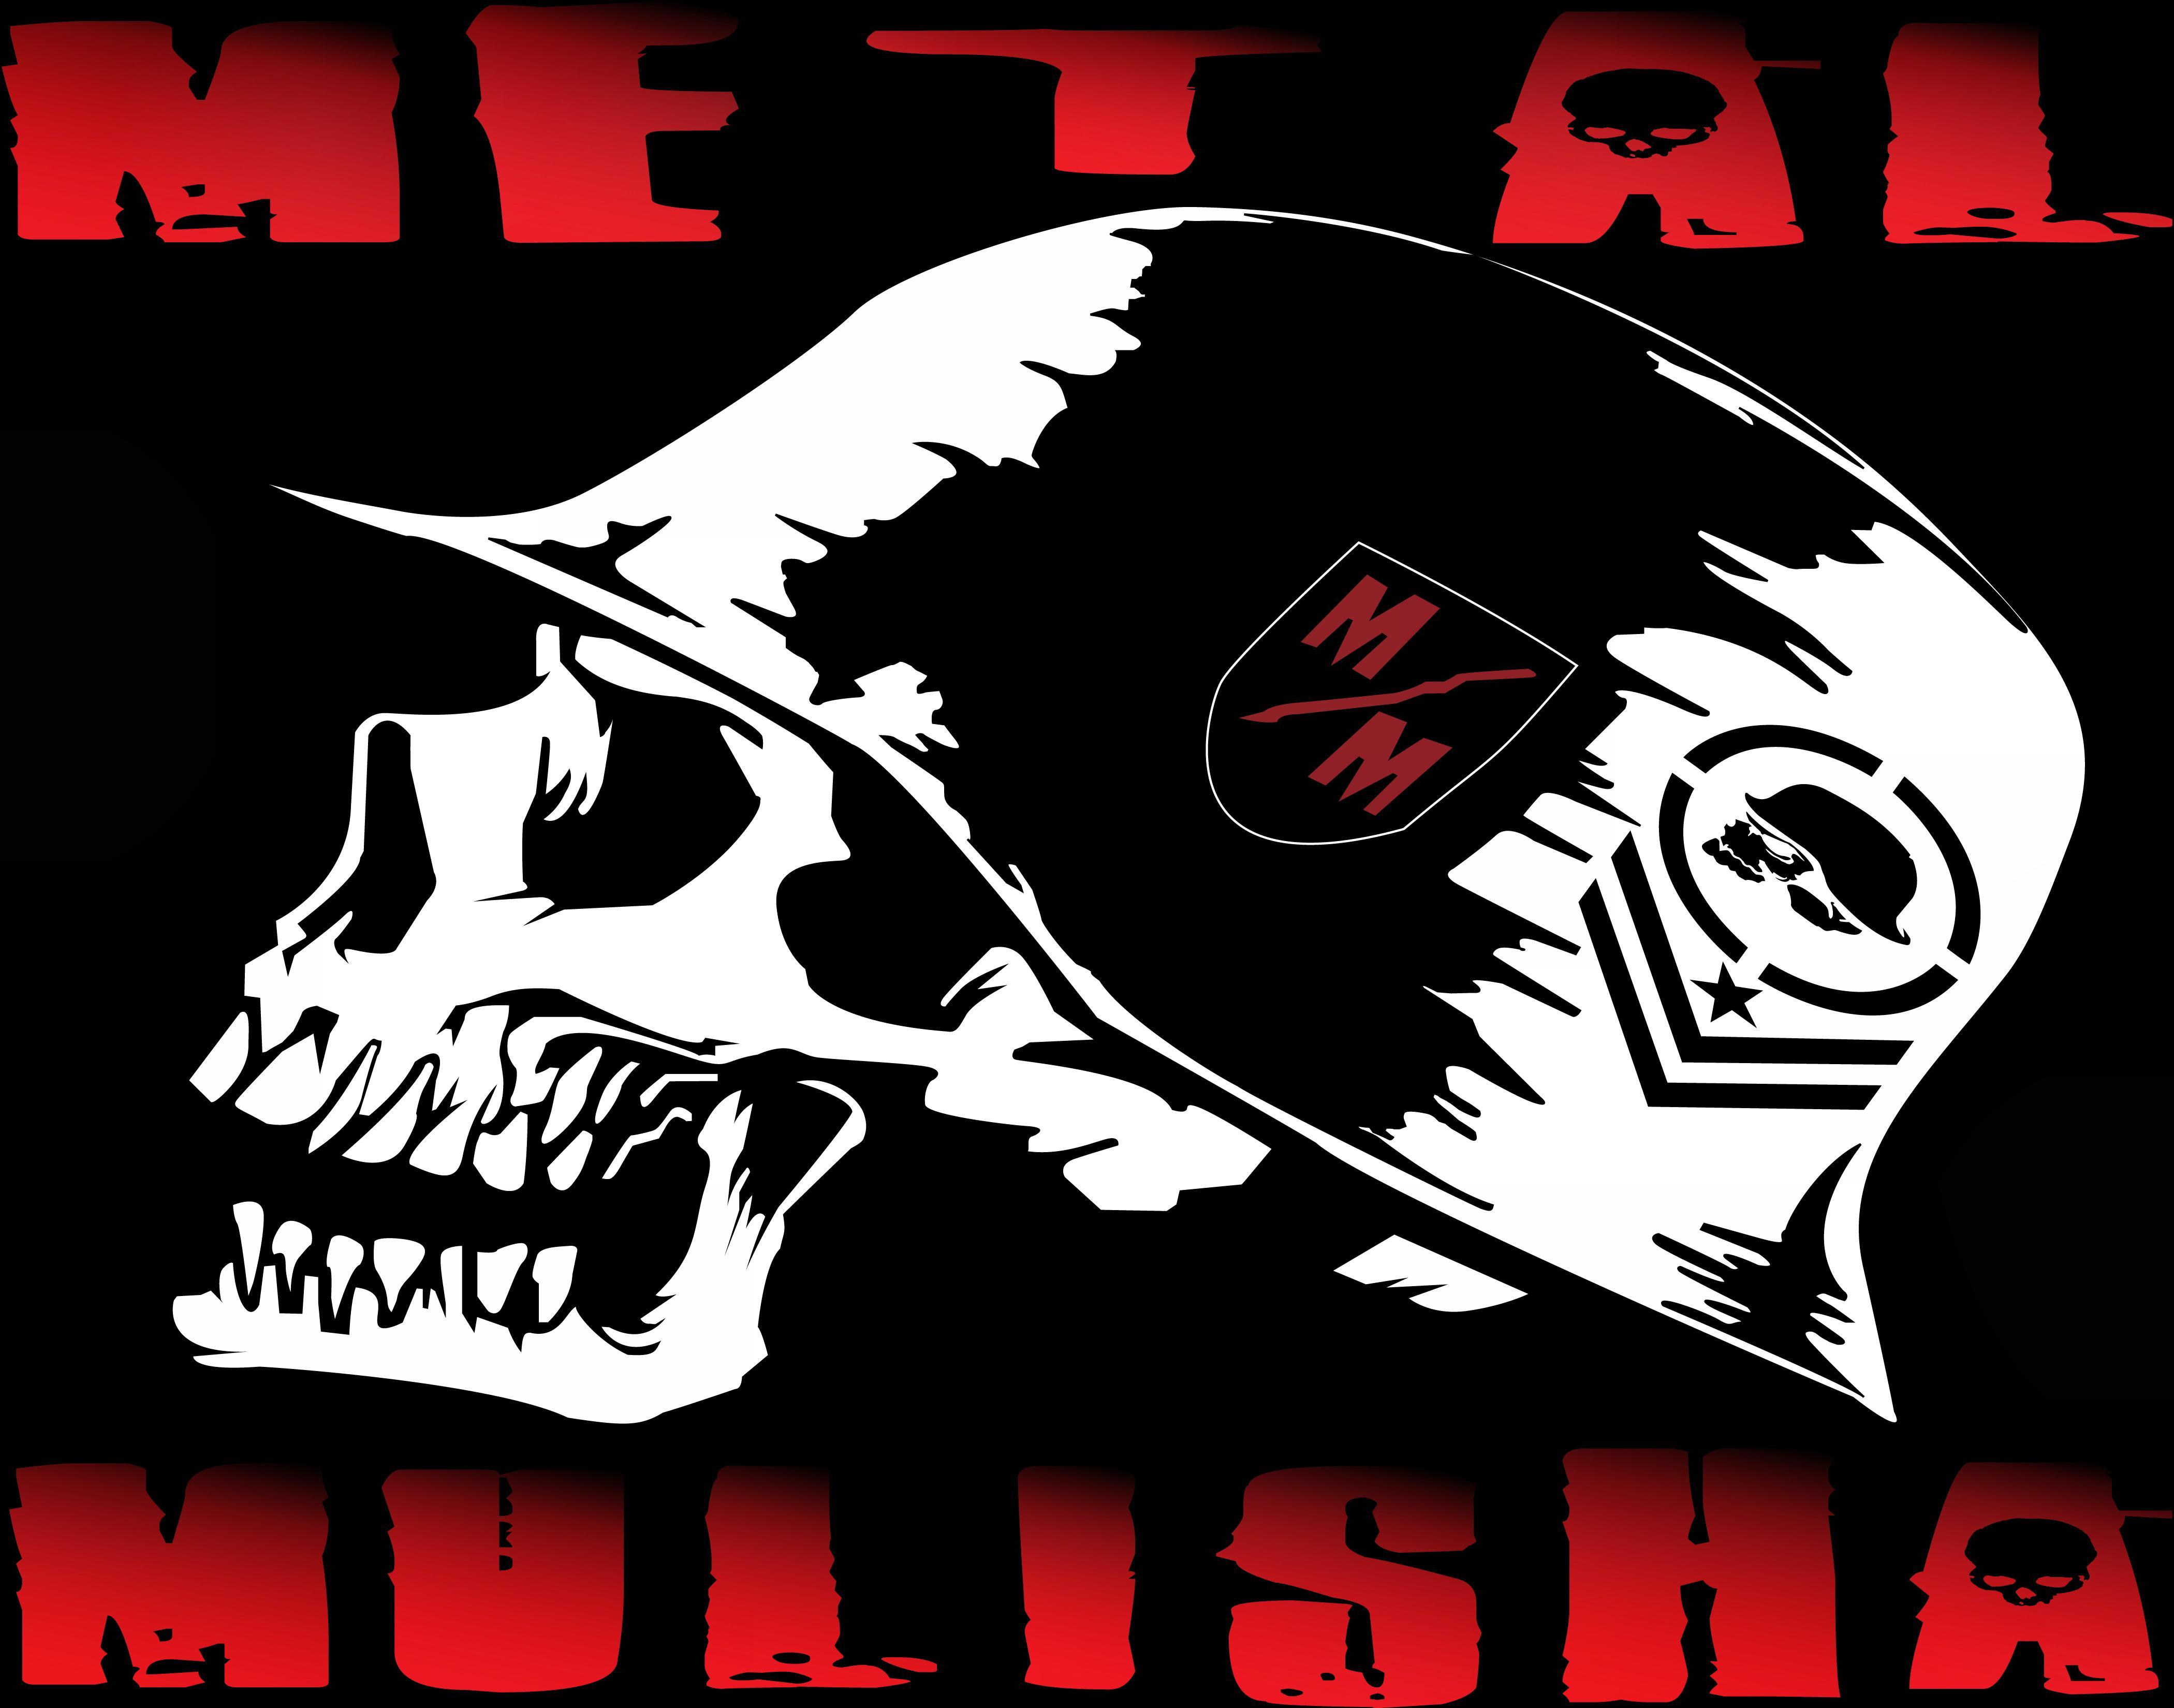 Metal Mulisha Wallpaper Desktop 23 Cool Hd